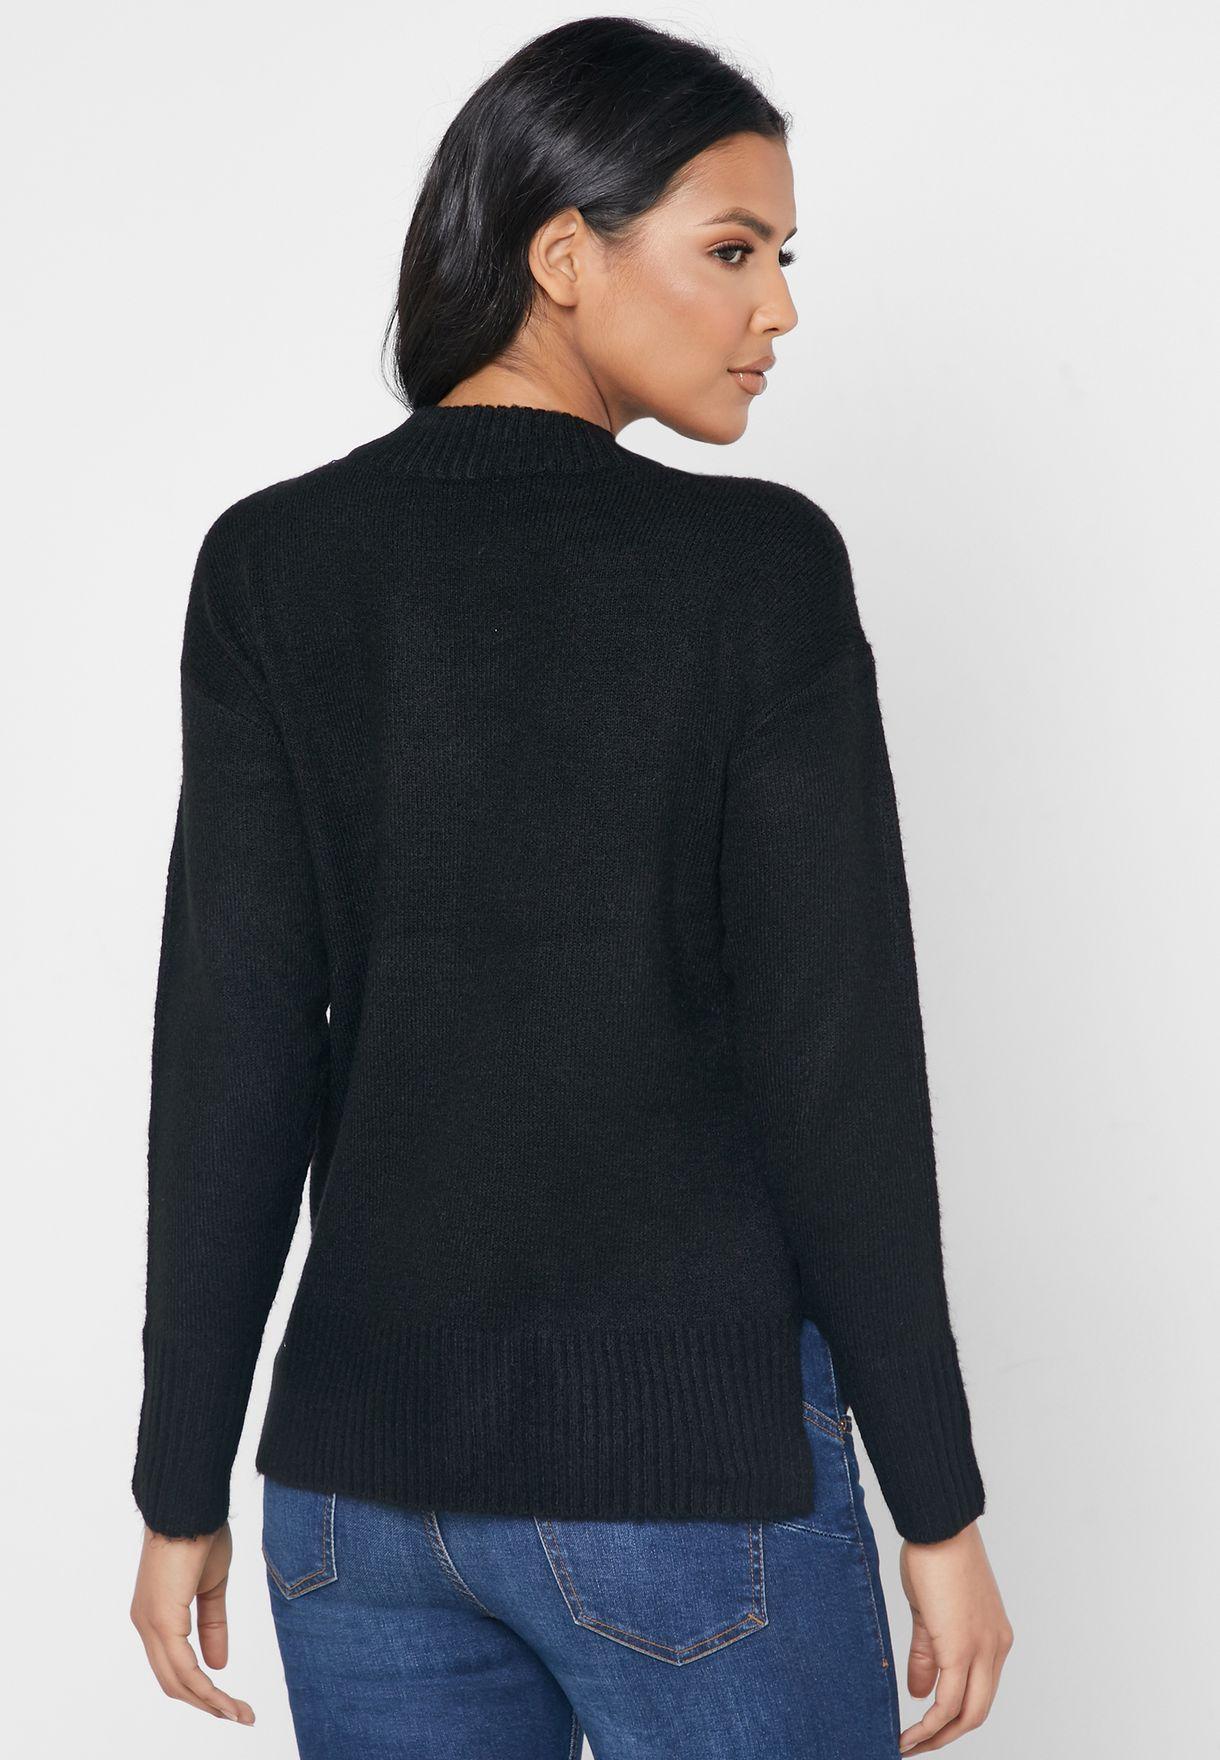 Ribbed Hem Crew Neck Sweater